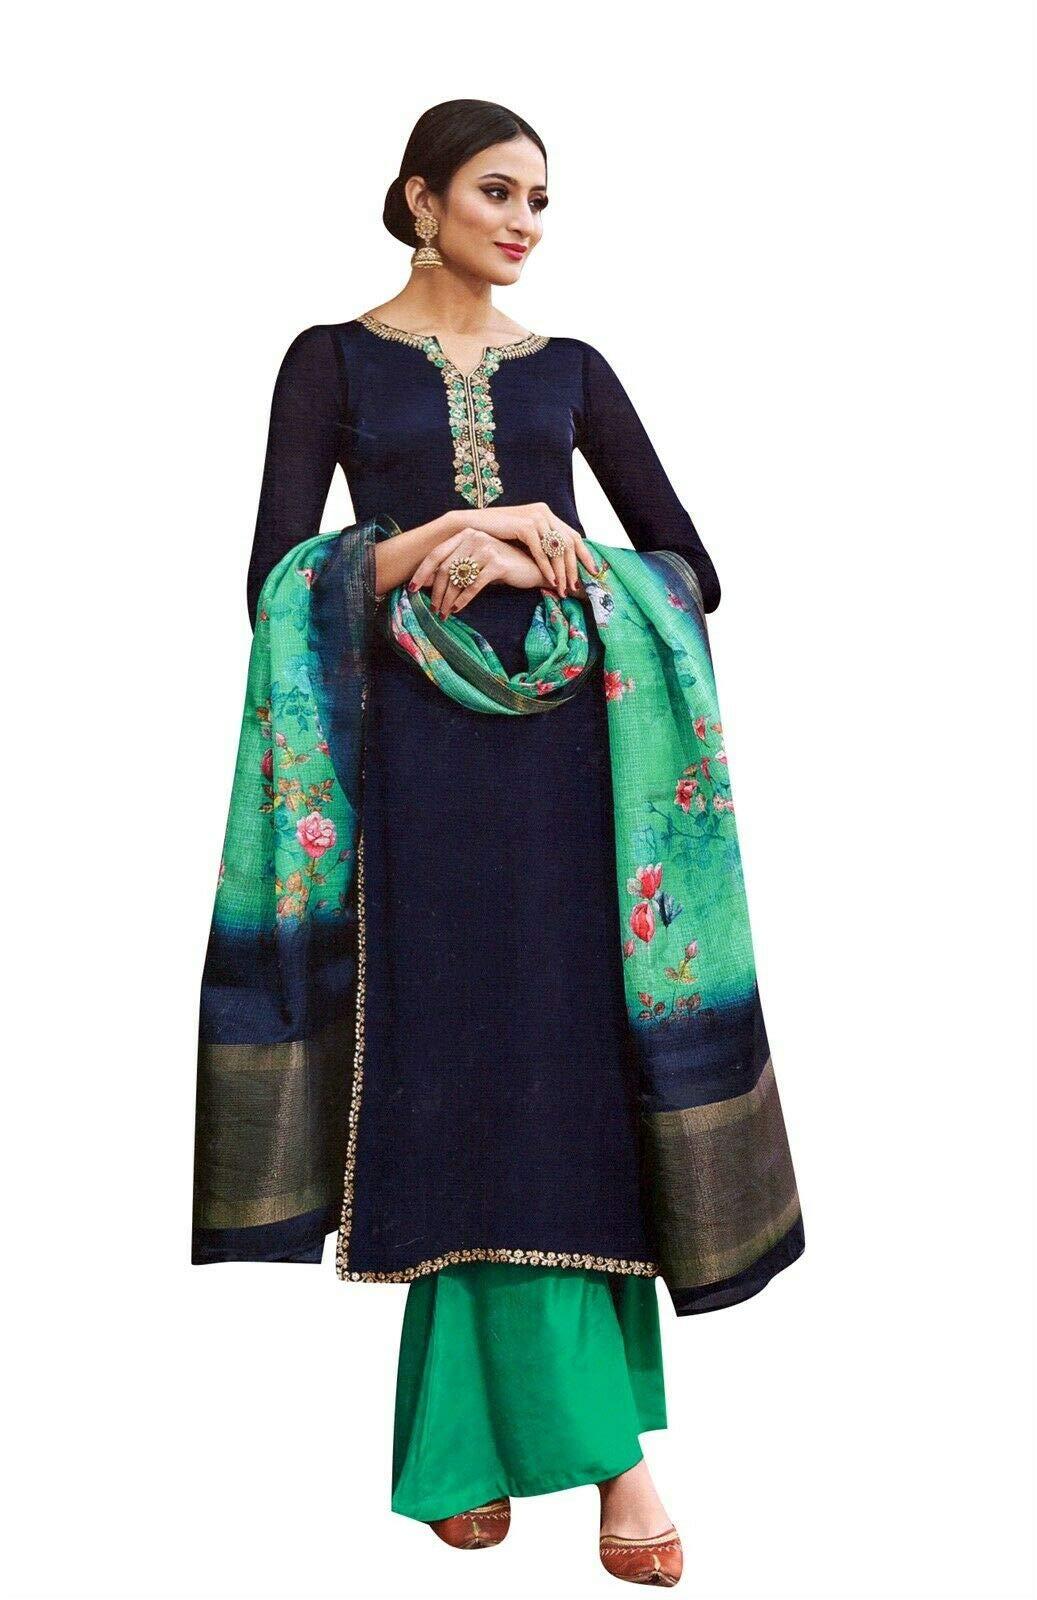 Ladyline Partywear Maslina Silk Embroidered Salwar Kameez with Chiffon Silk Dupatta Wedding Indian Dress (Size_46/ Navy Blue)